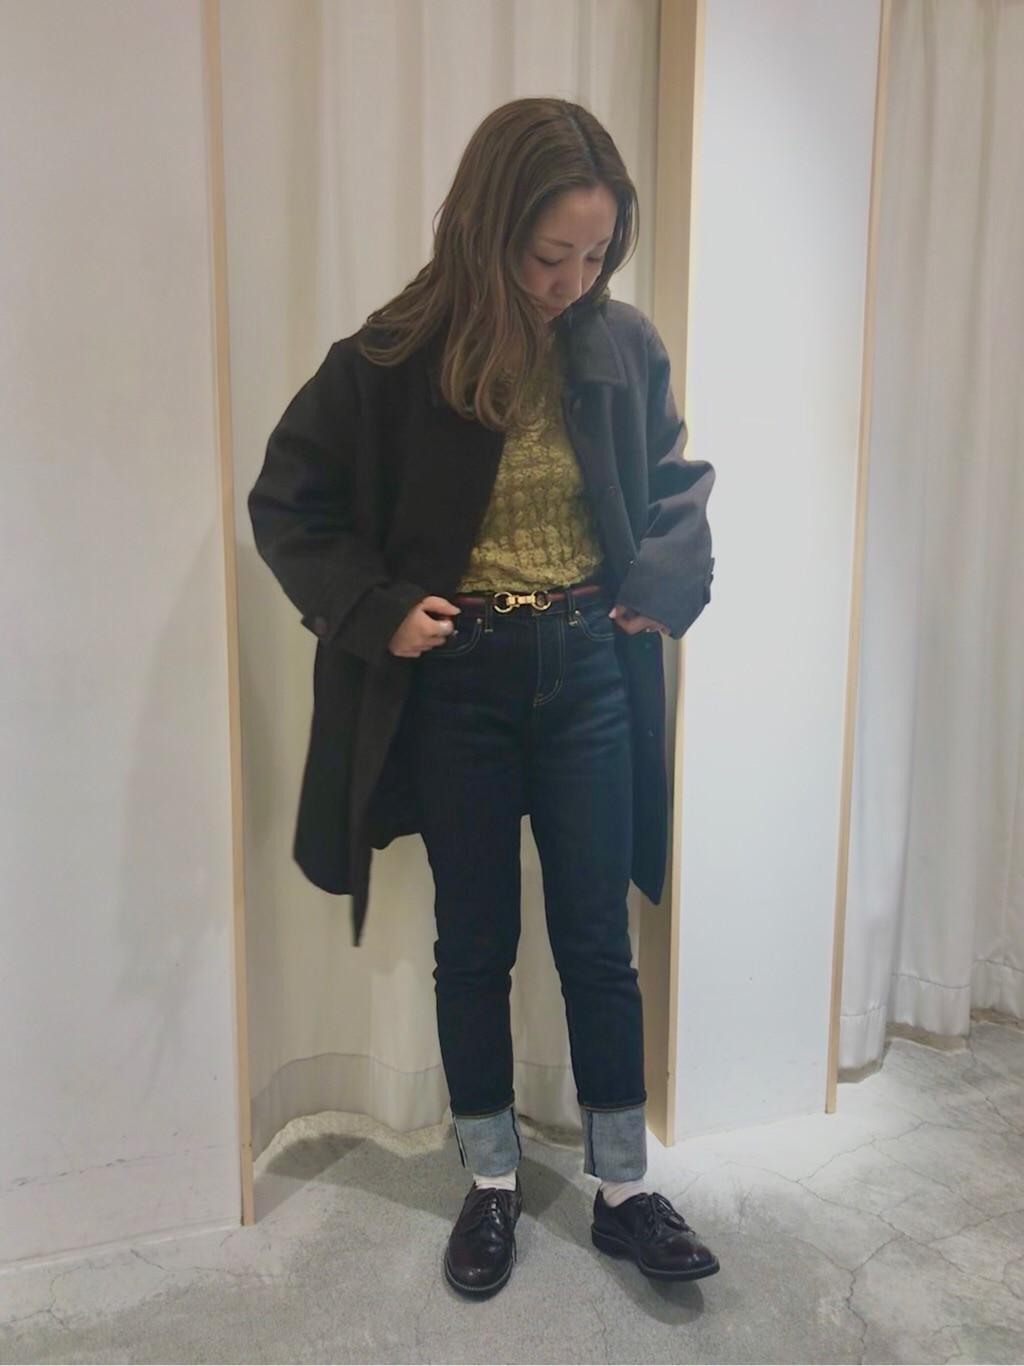 Dot and Stripes CHILD WOMAN ペリエ千葉 身長:155cm 2019.11.27